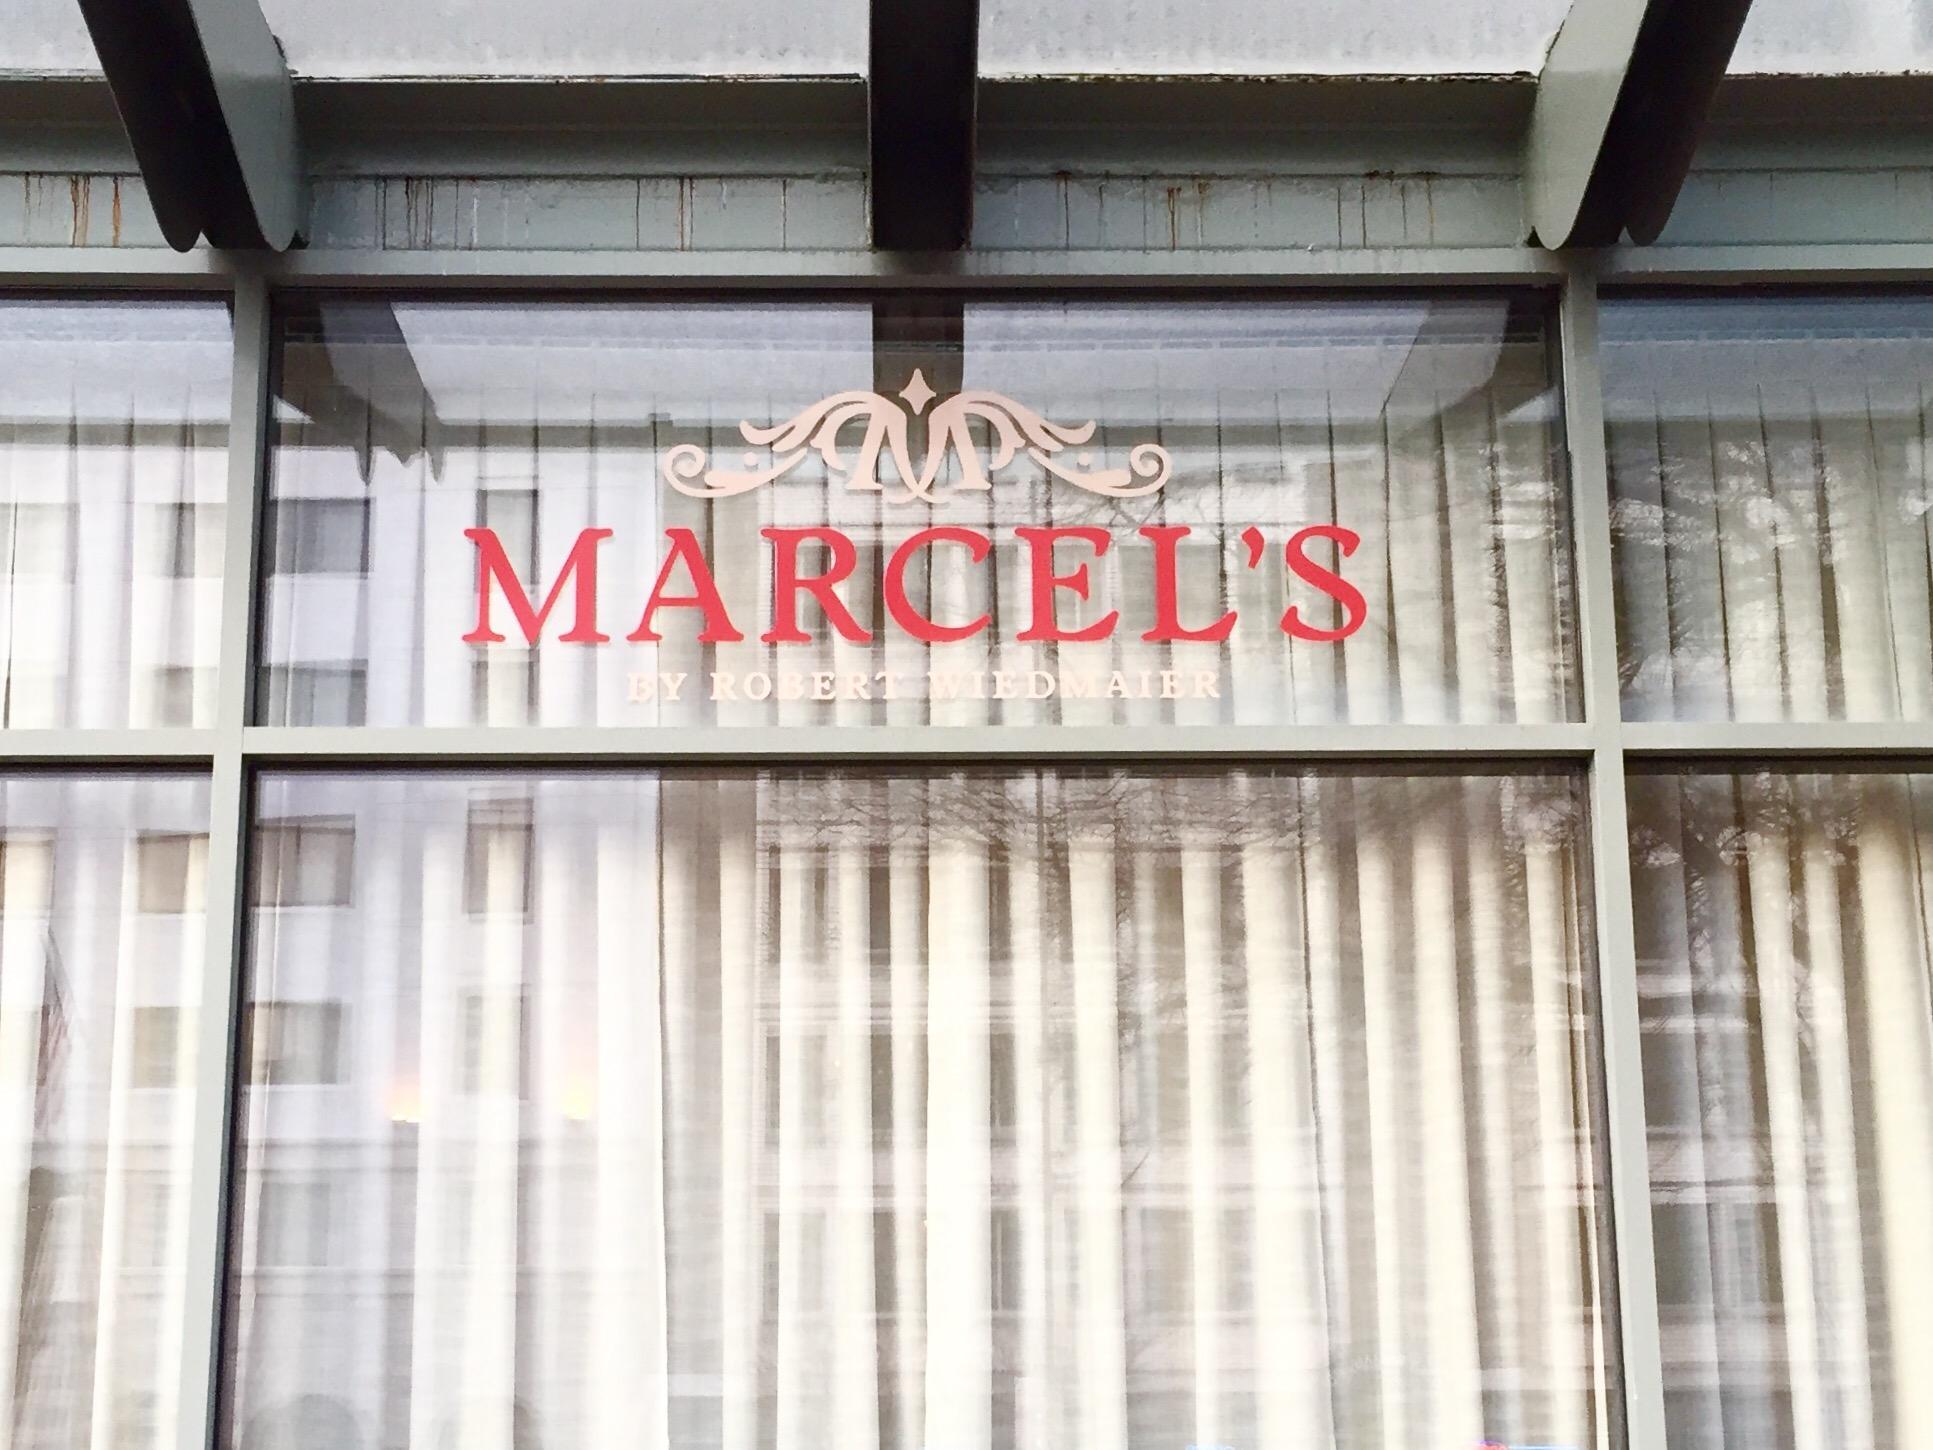 Marcel's – Eat Now Run Later